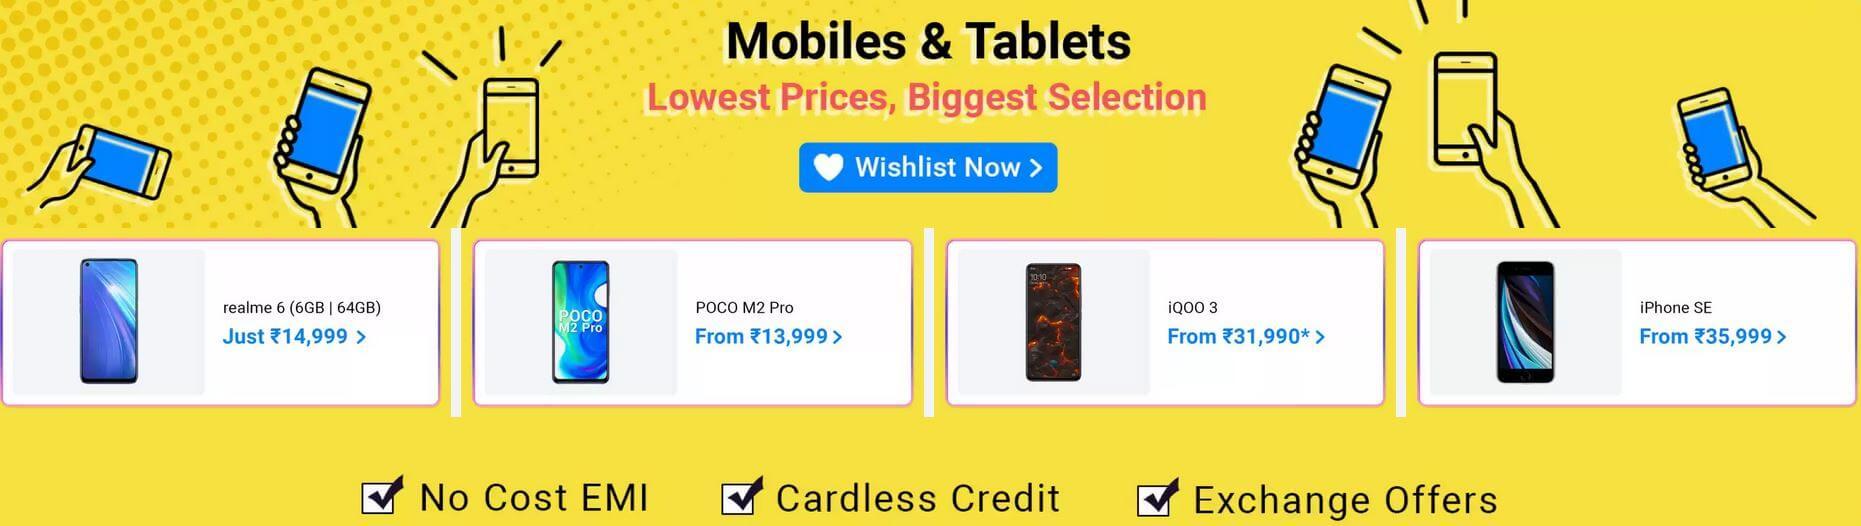 Flipkart Big Saving Days Sale offers on Mobiles